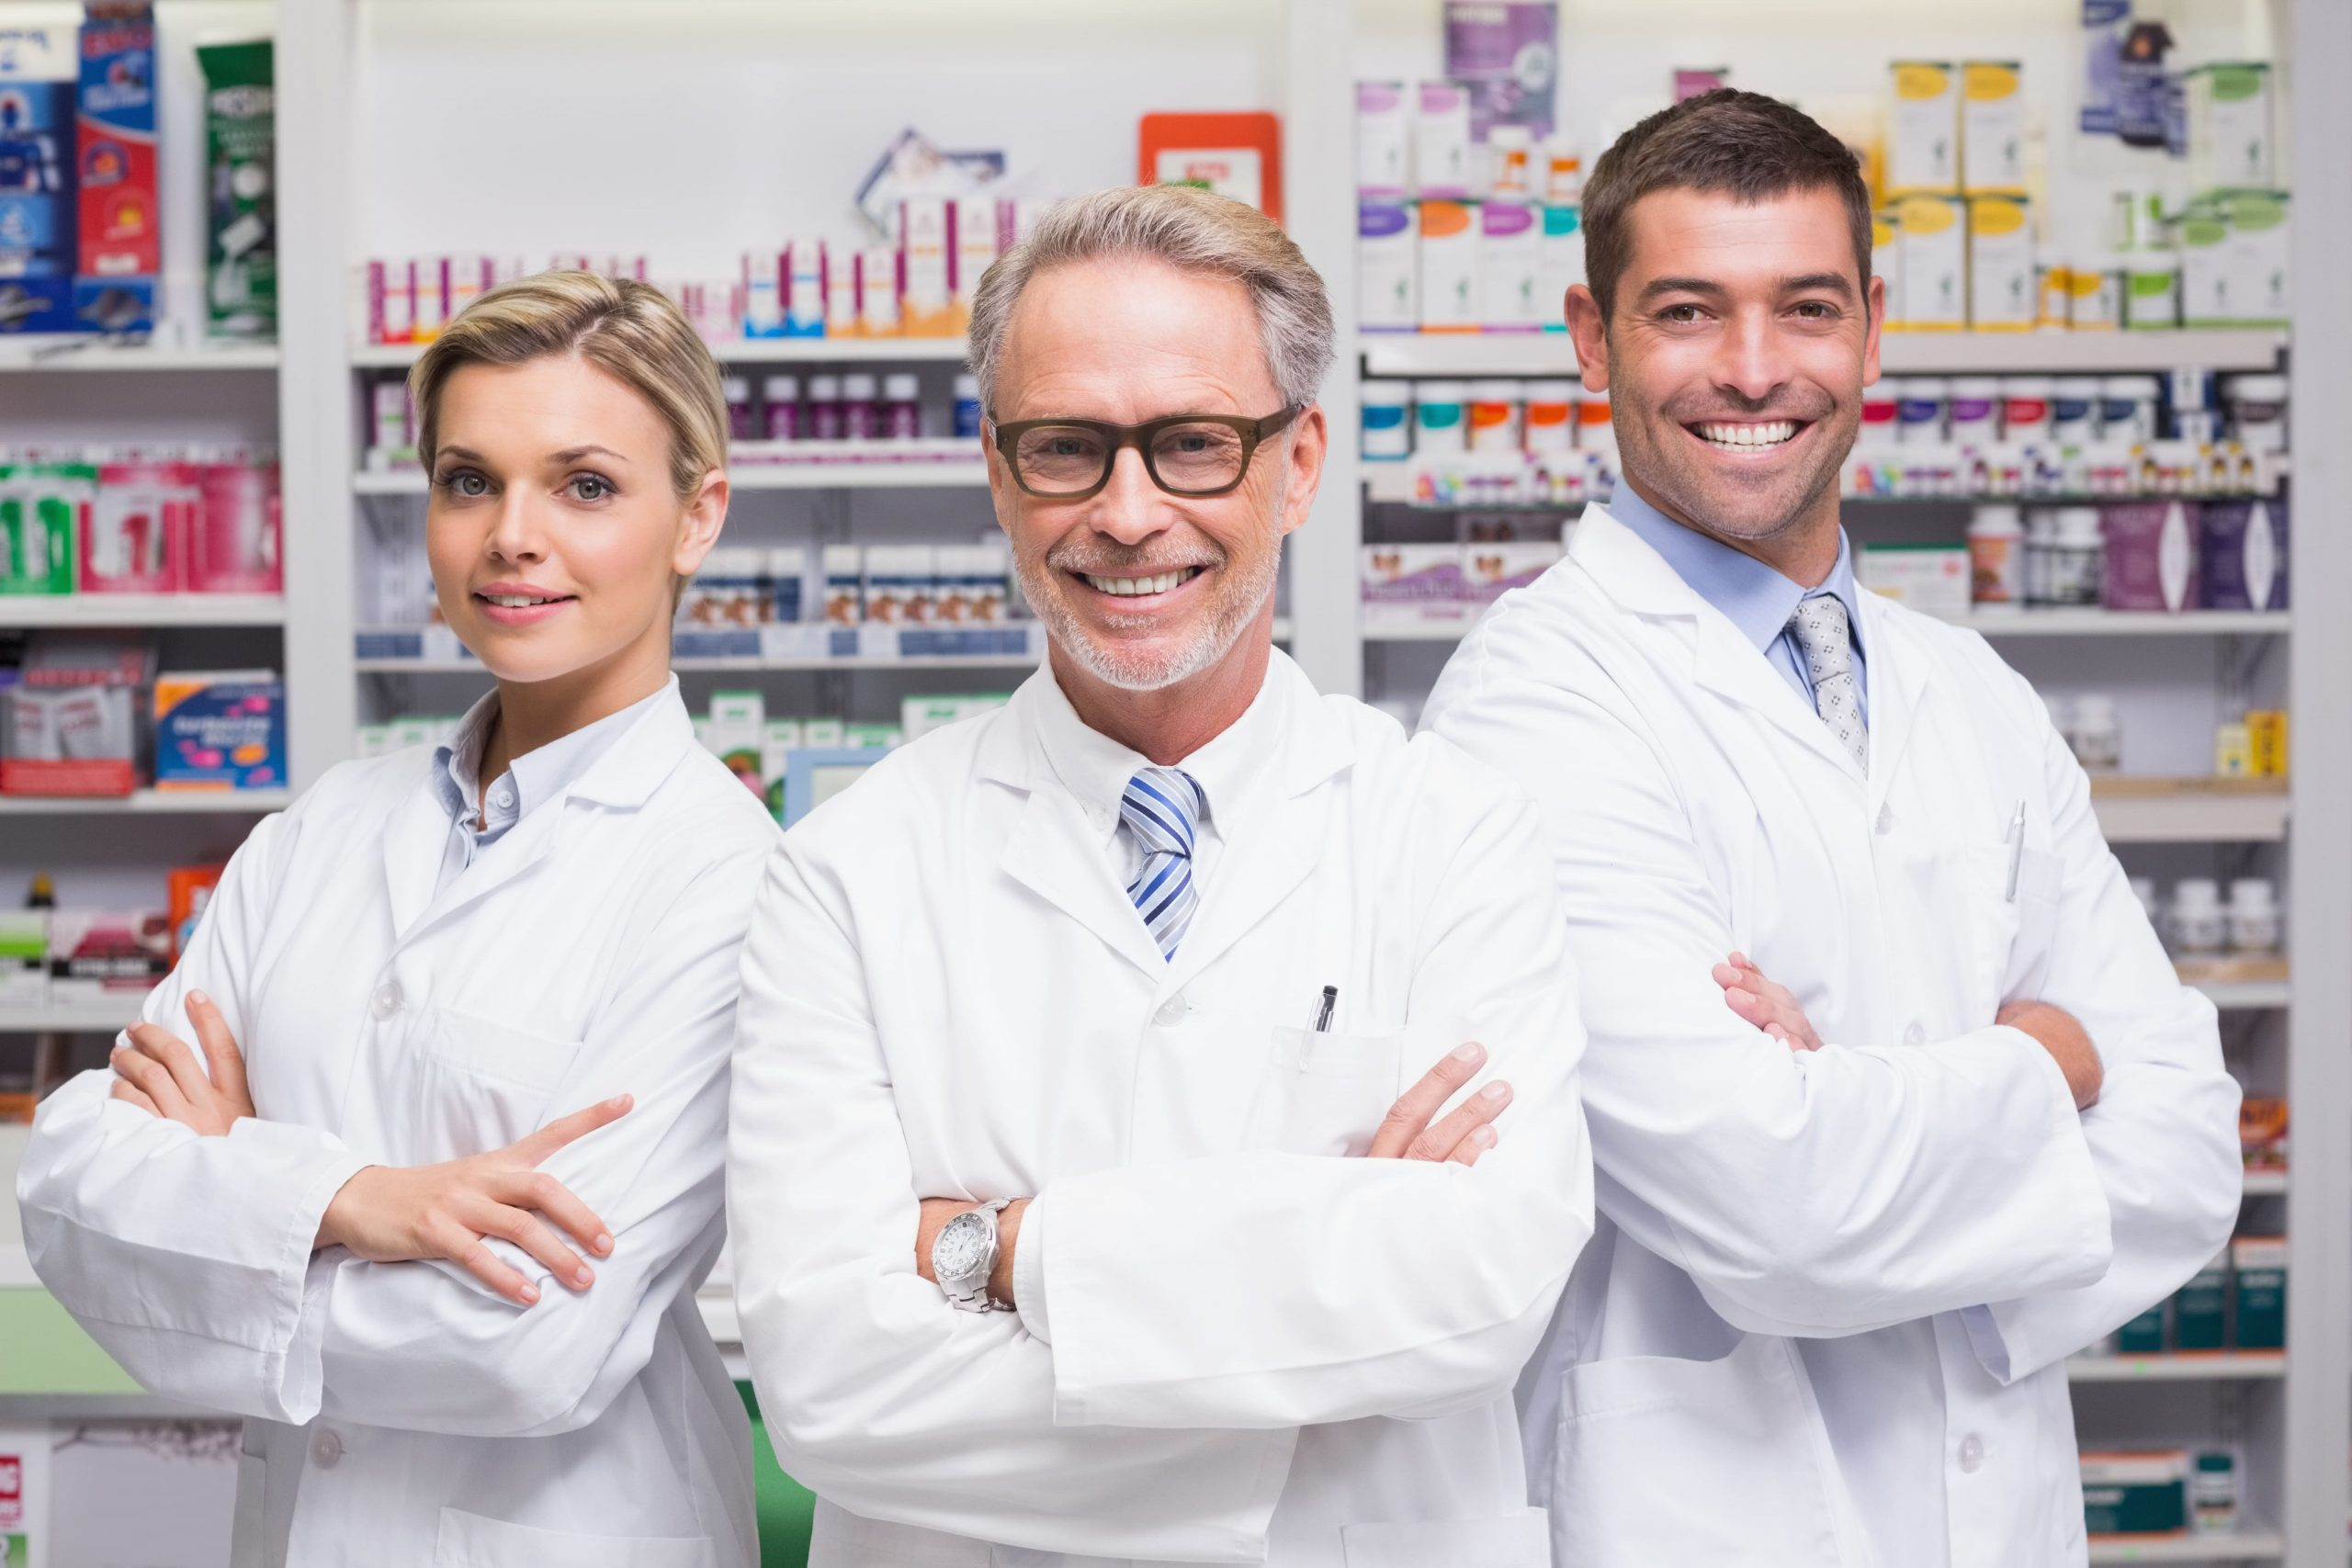 team-pharmacists-smiling-camera